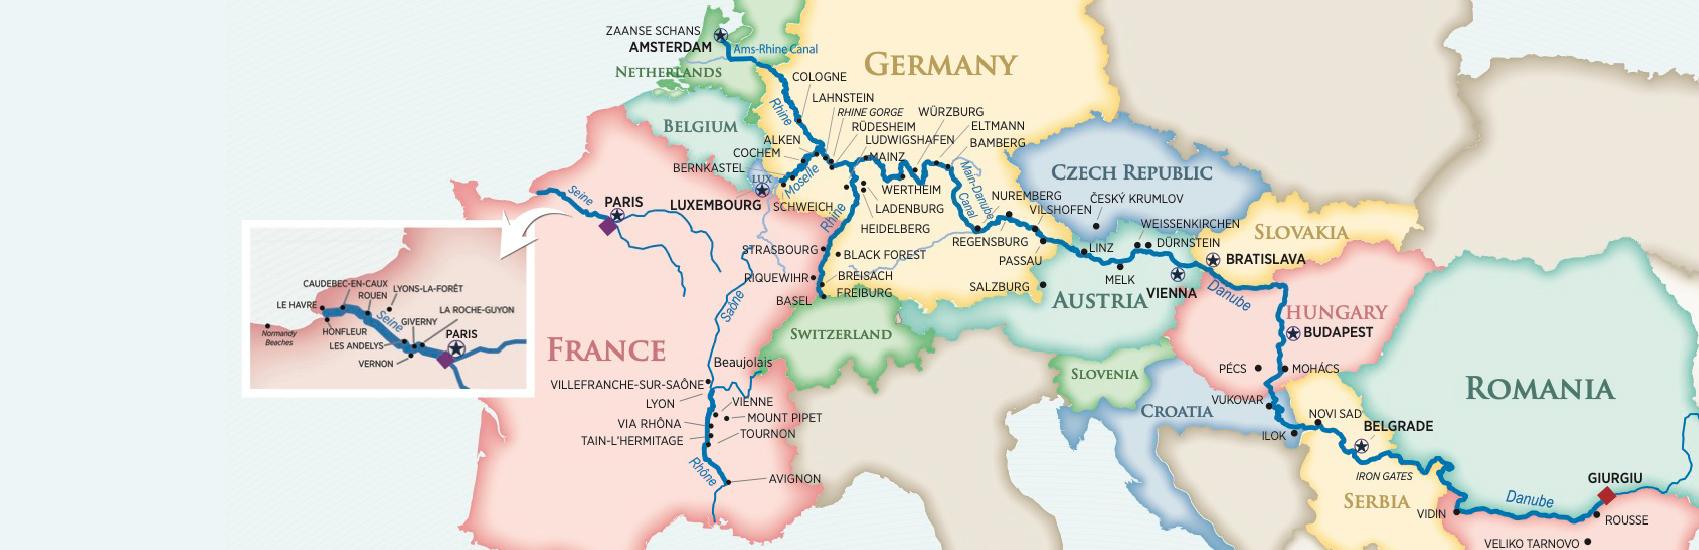 AmaWaterways Seven River Journey Through Europe 5